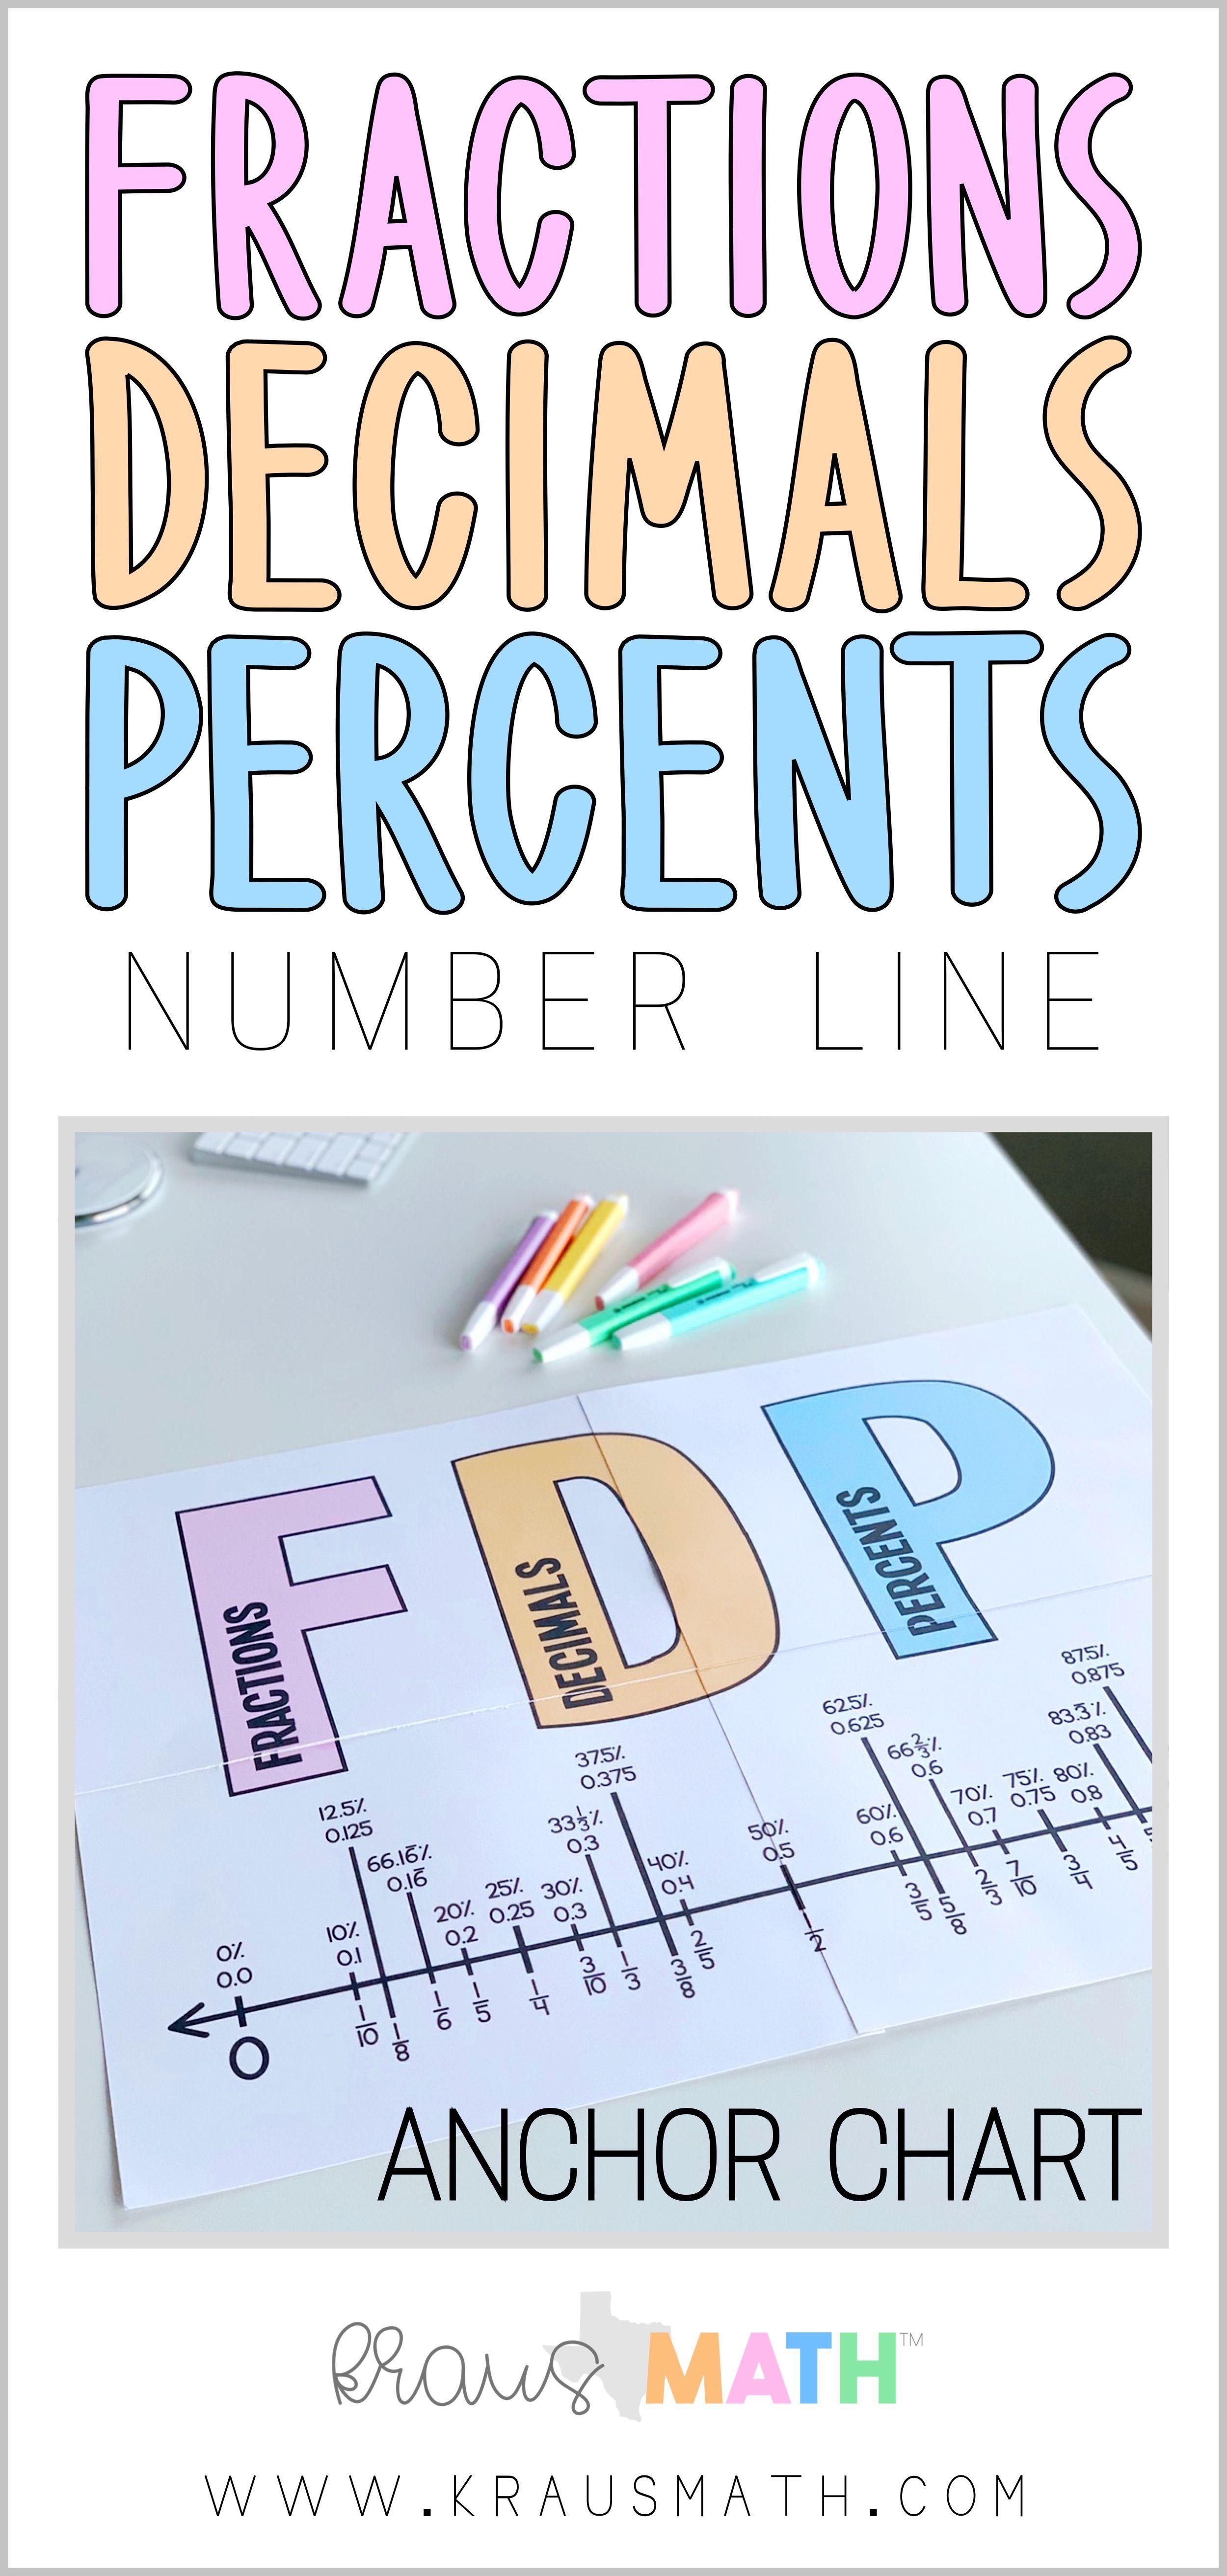 Fraction Decimal Percent Equivalency Number Line Kraus Math Fractions Decimals Percents Decimals Fractions Decimals Percents Anchor Chart